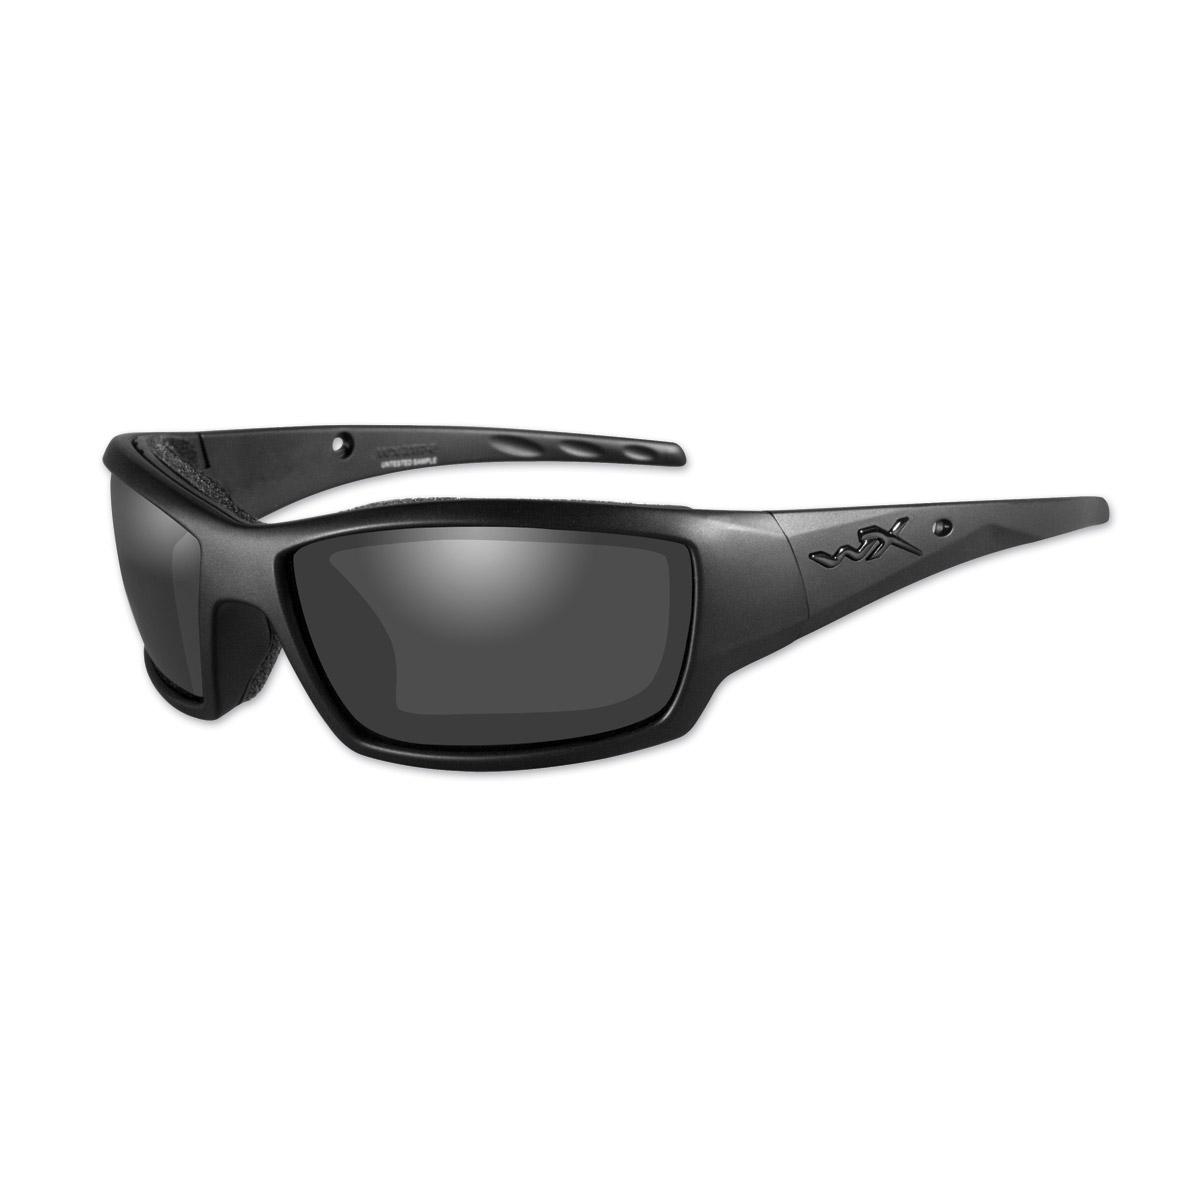 Wiley X WX Tide Gloss Black Frame w/Smoke Grey Lens Sunglasses